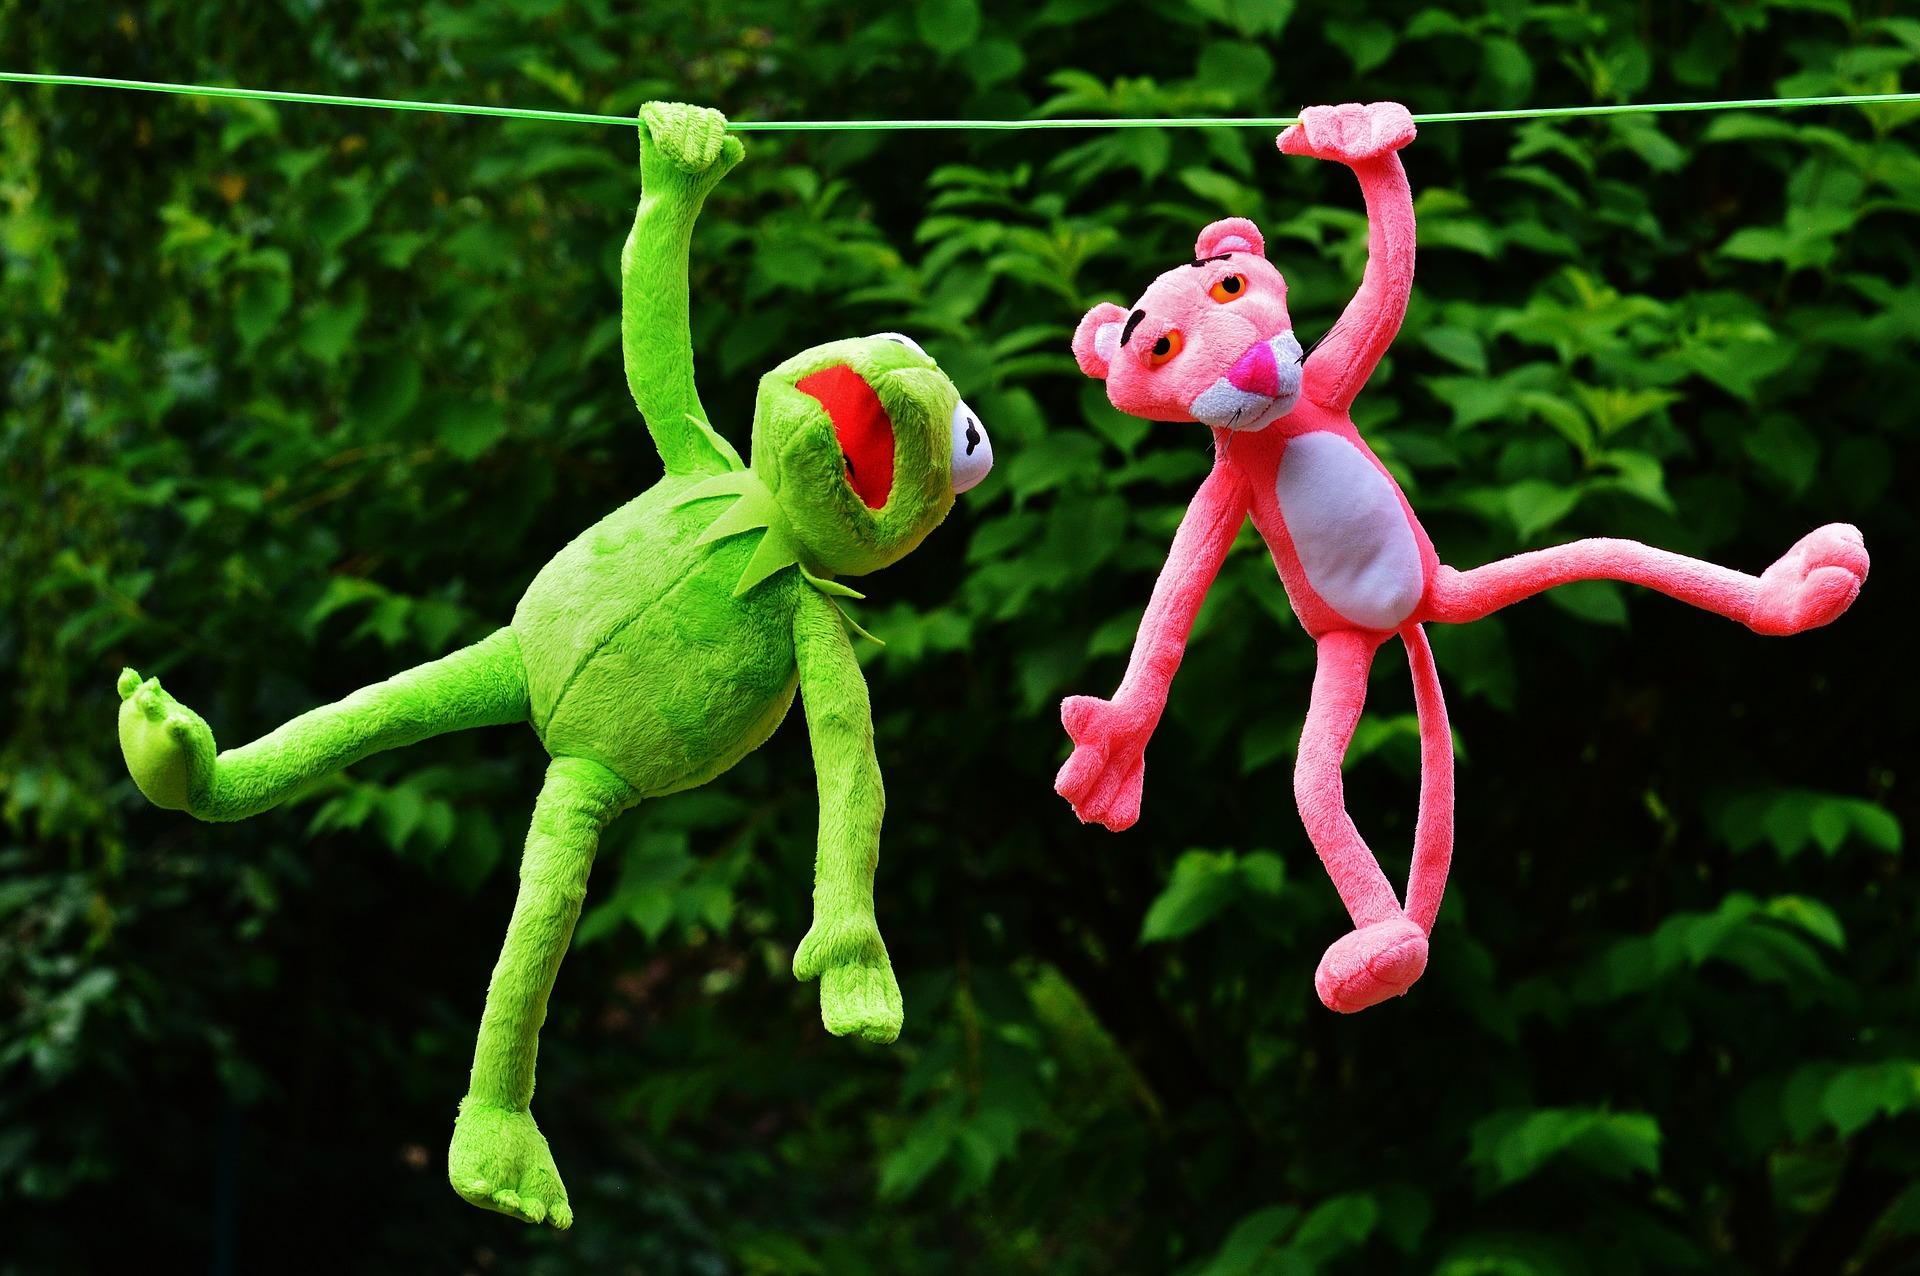 brinquedos, brinquedos de pelúcia, Gustavo, Pantera cor de rosa, Kermit, Pendurado - Papéis de parede HD - Professor-falken.com